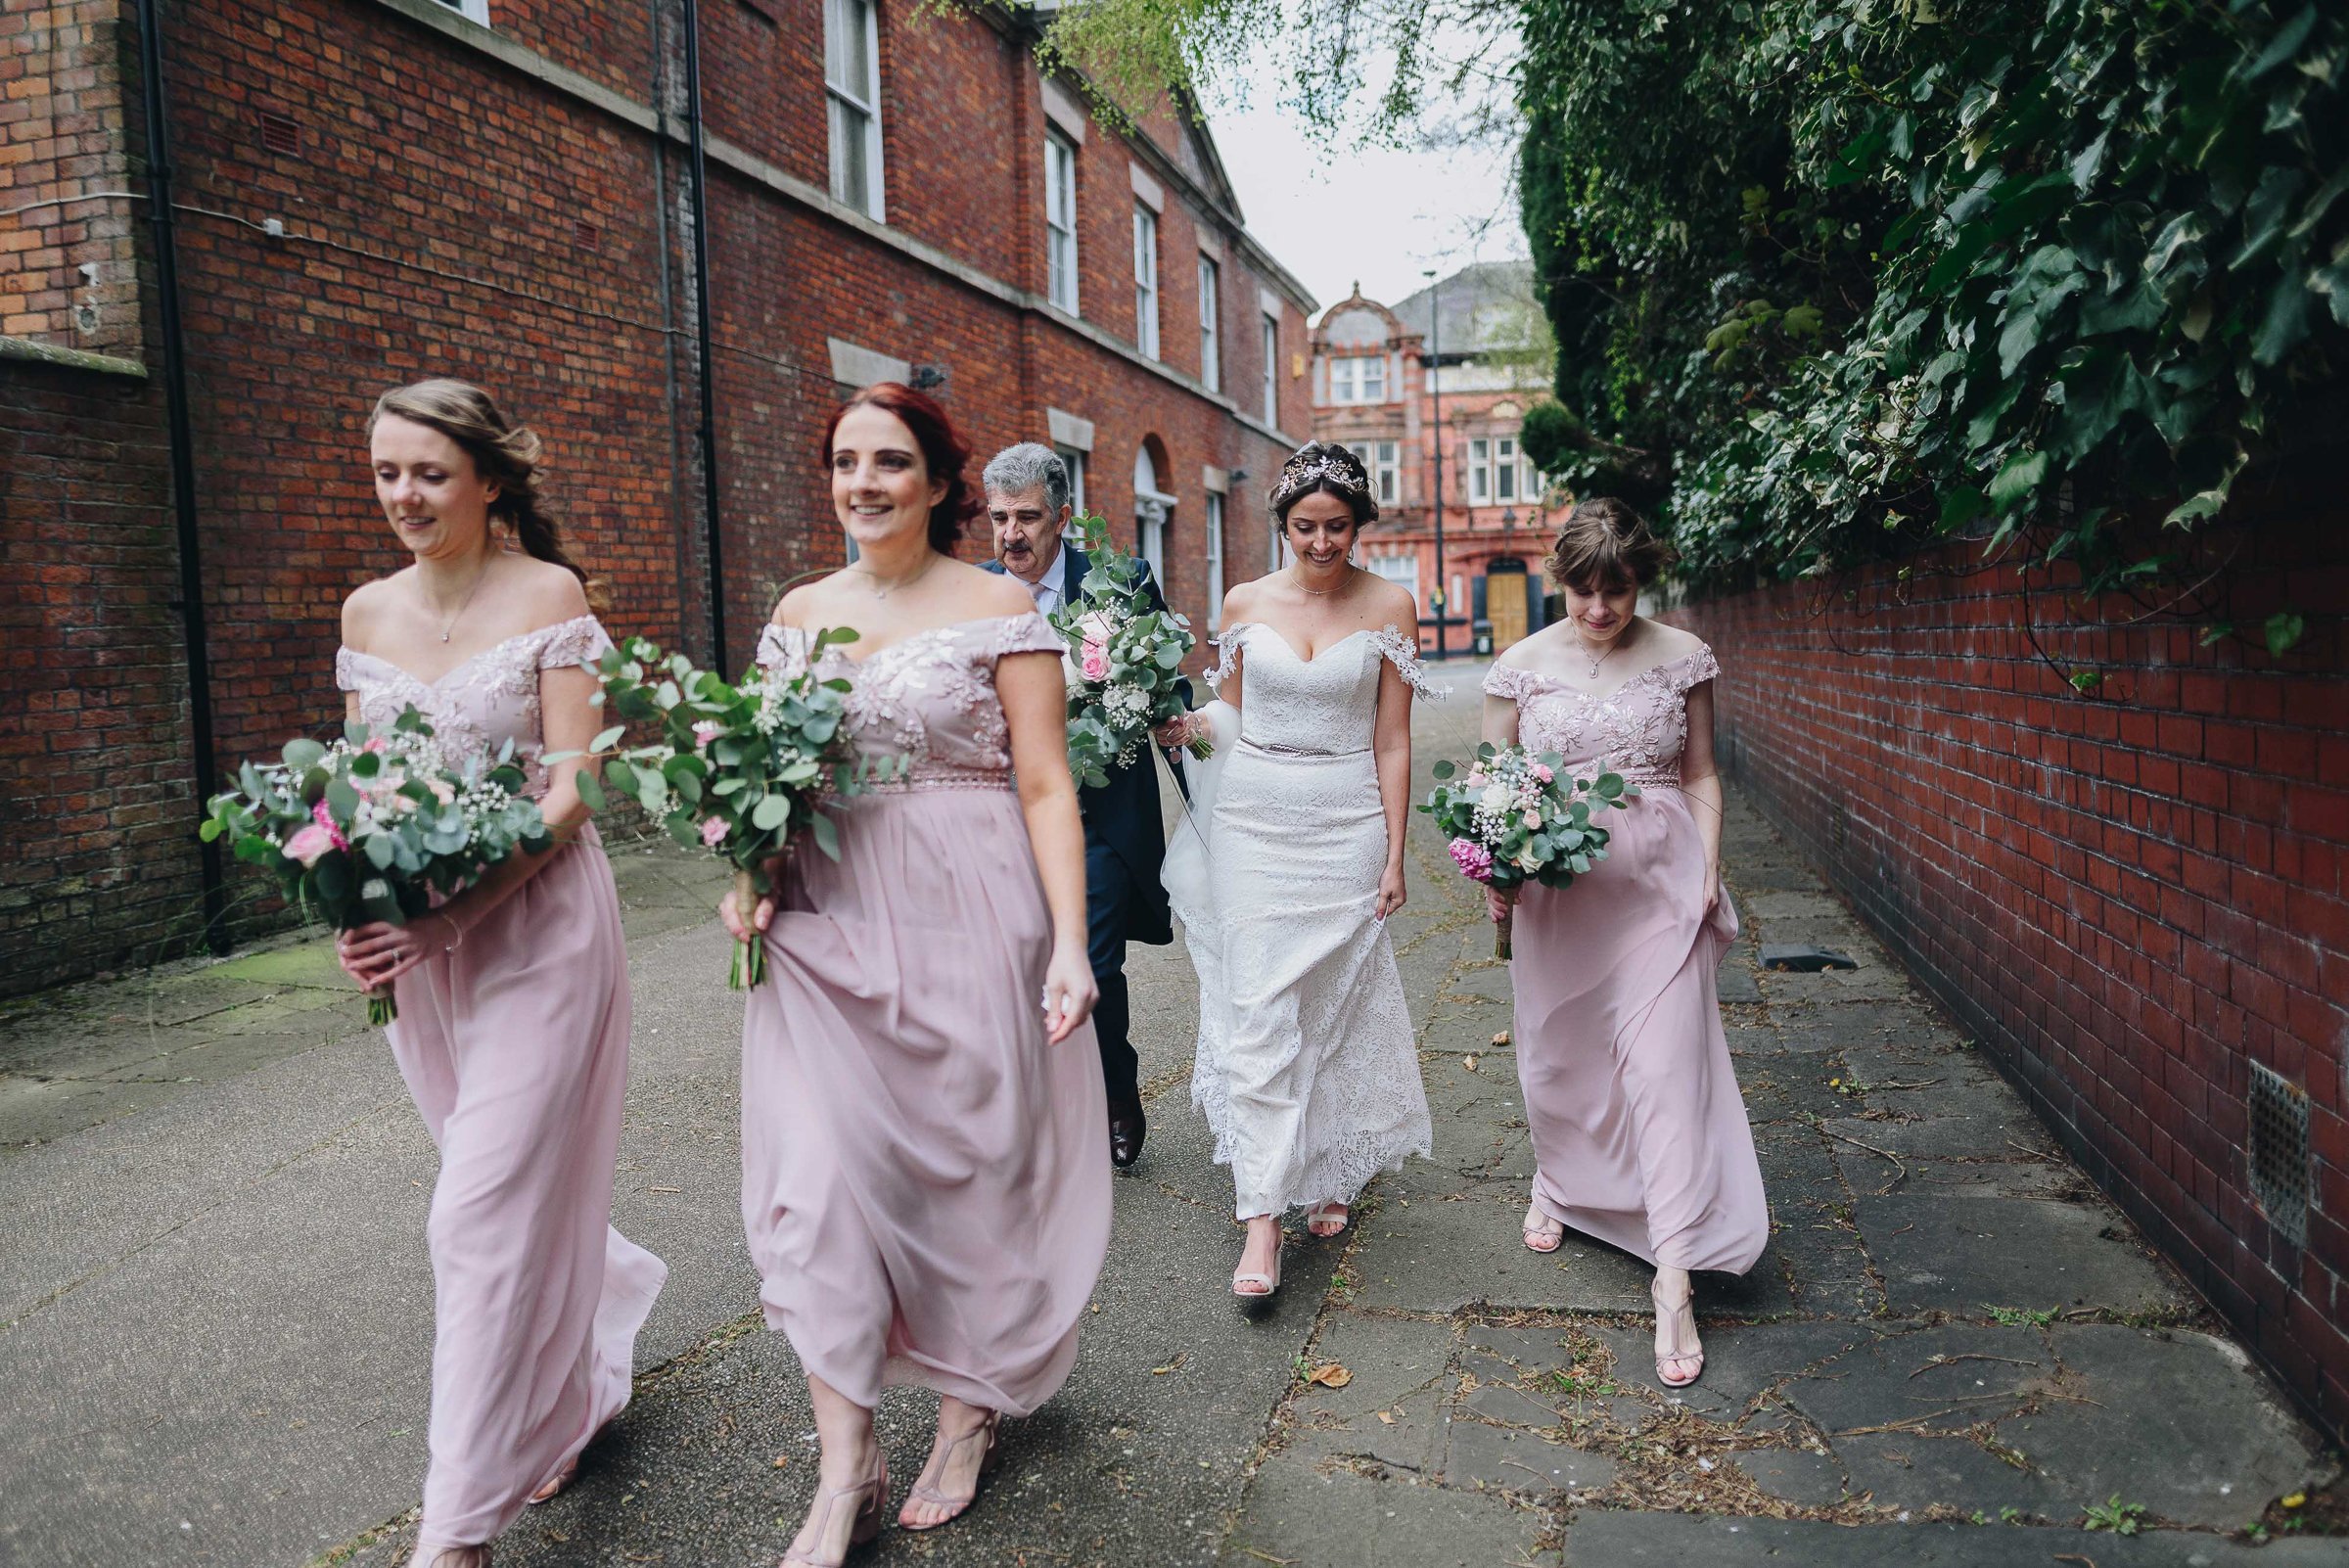 Rochdale-town-hall-vegan-harry-potter-wedding-photography-13.jpg